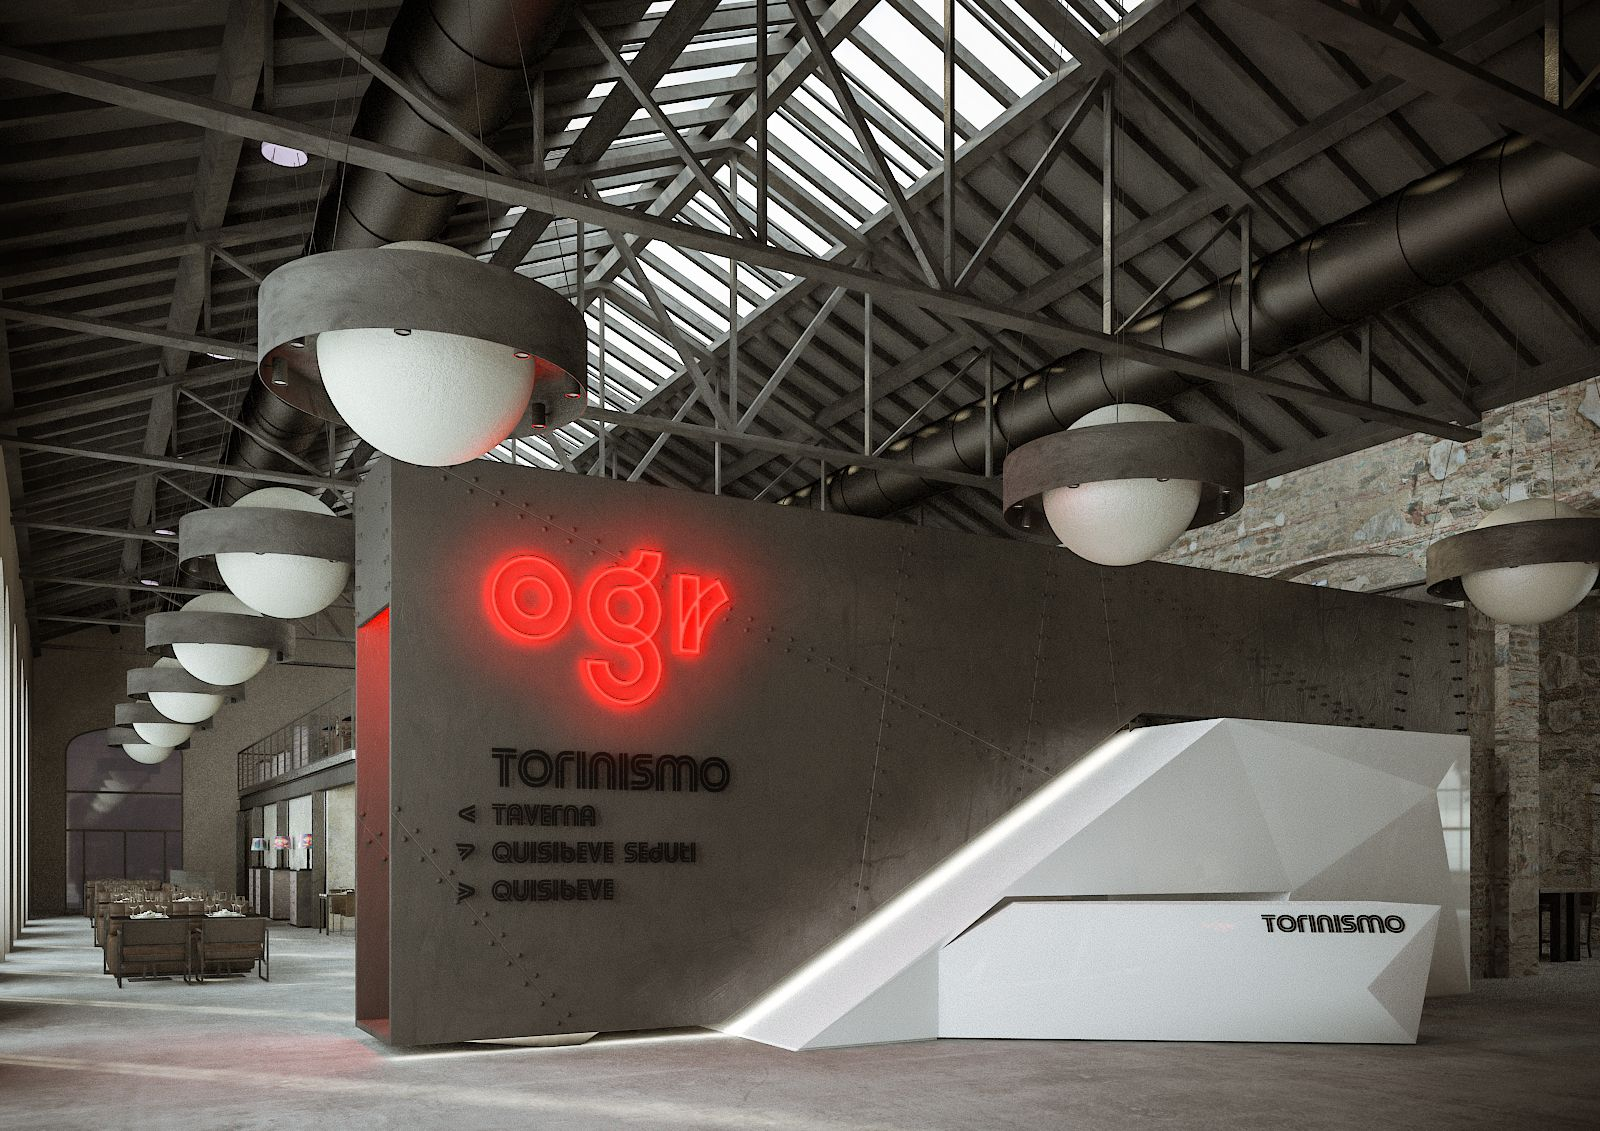 OGR - Turin 376